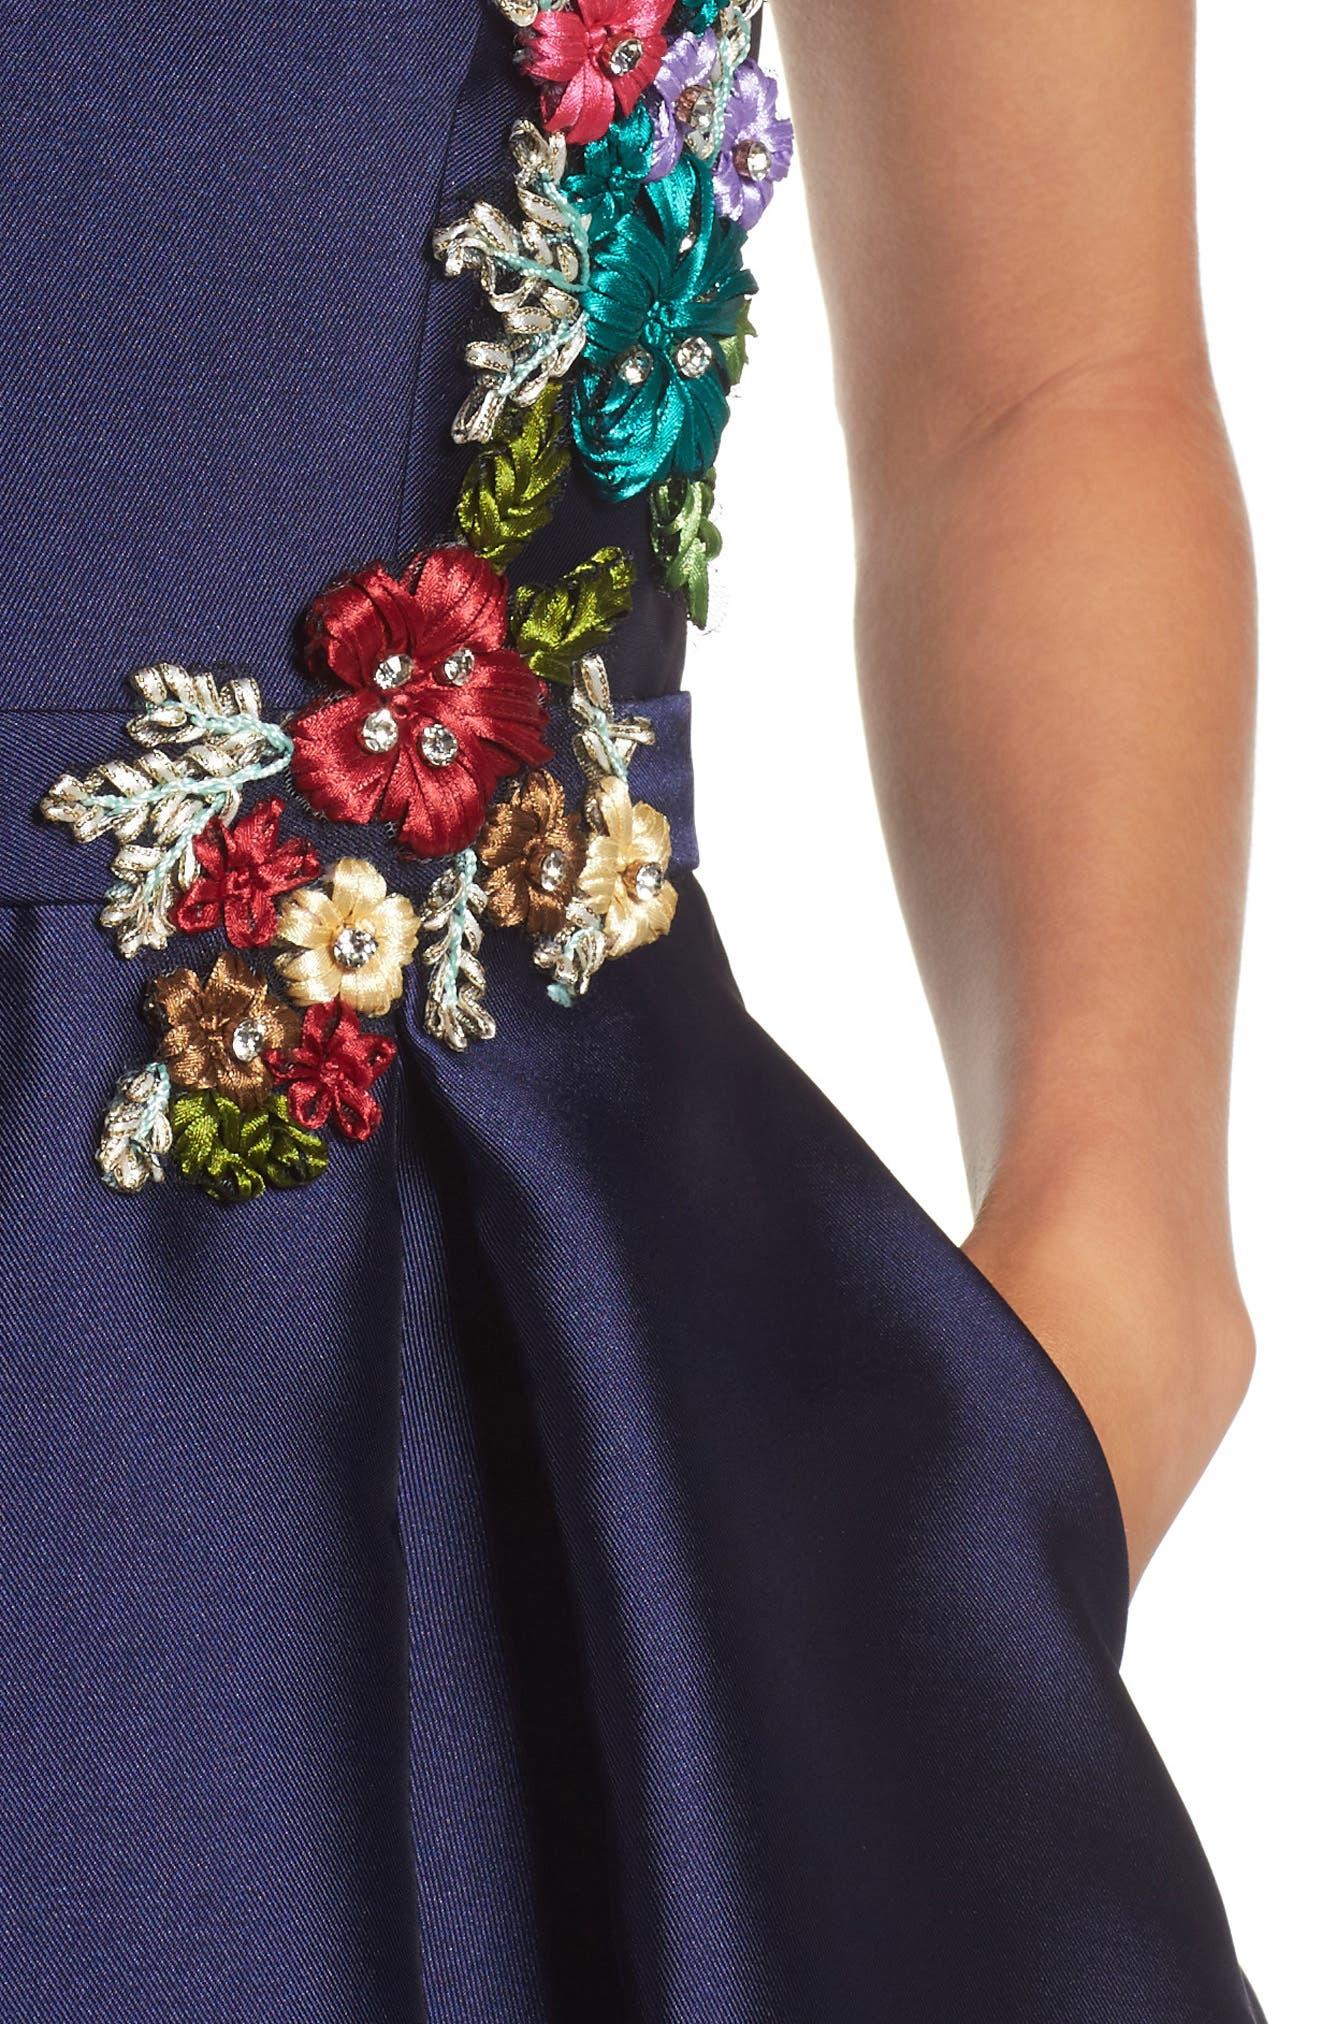 Micado Floral Appliqué Fit & Flare Minidress,                             Alternate thumbnail 4, color,                             MIDNIGHT